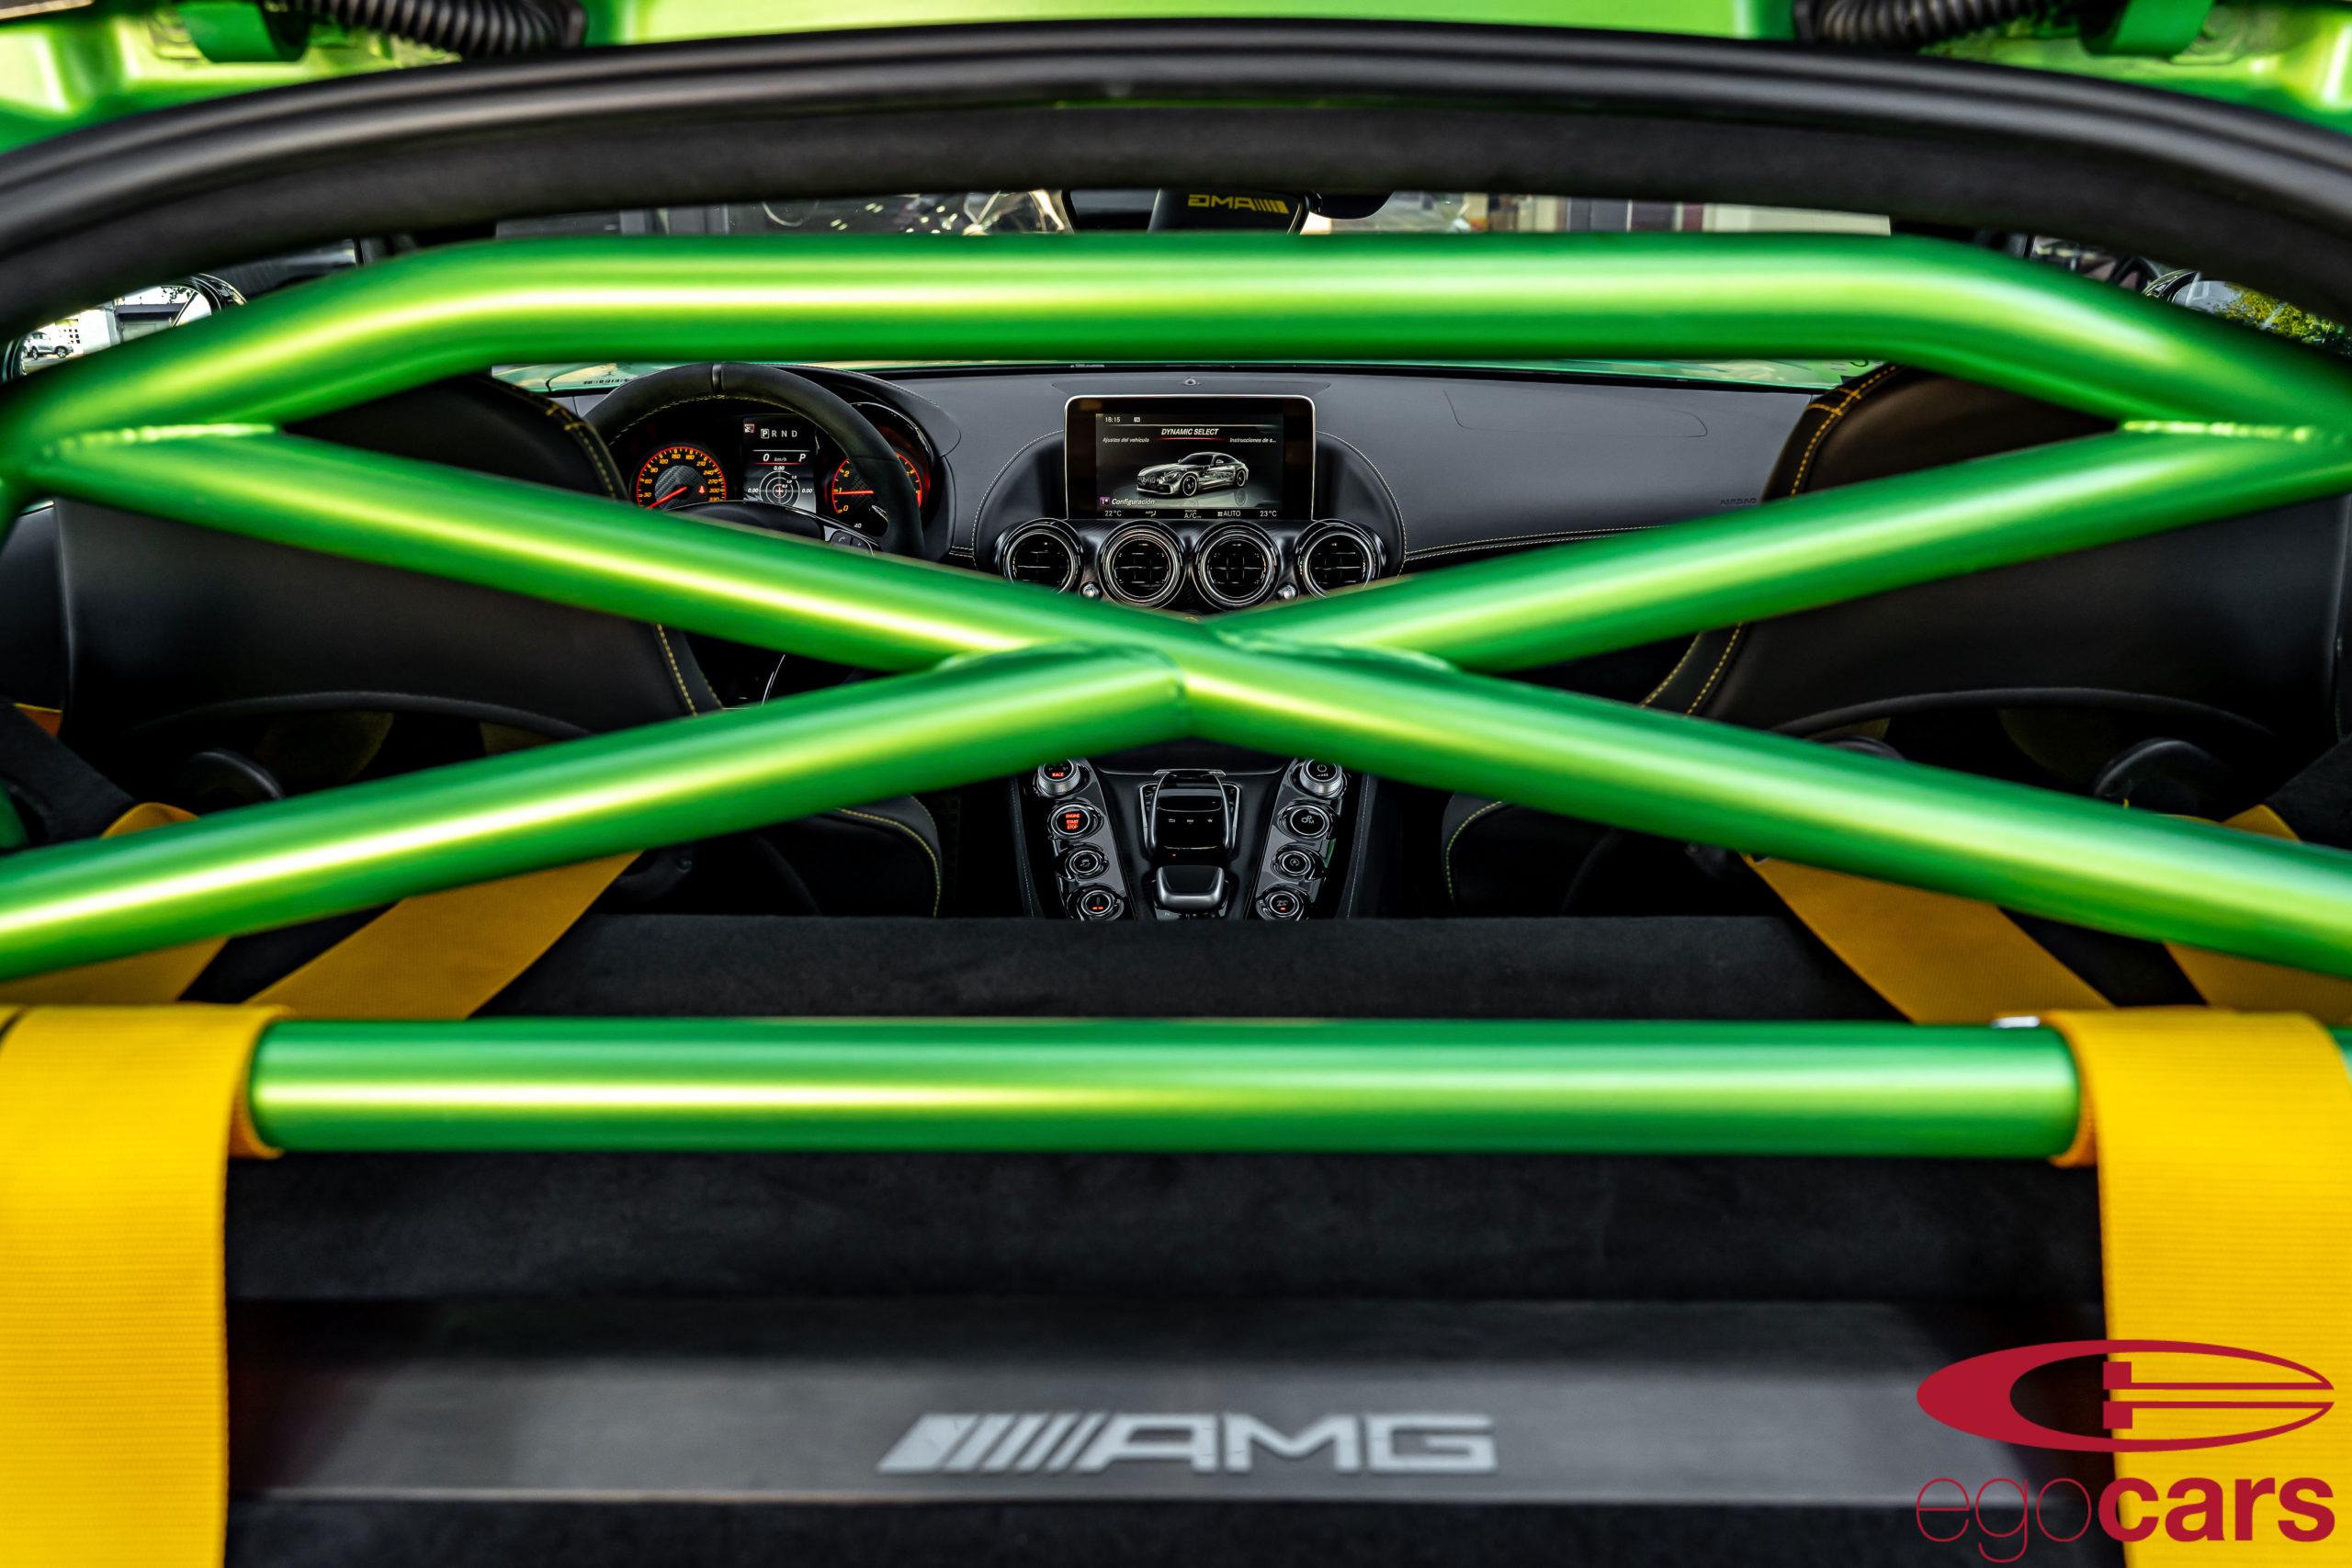 AMG GTR GREEN MAGNO EGOCARS_25